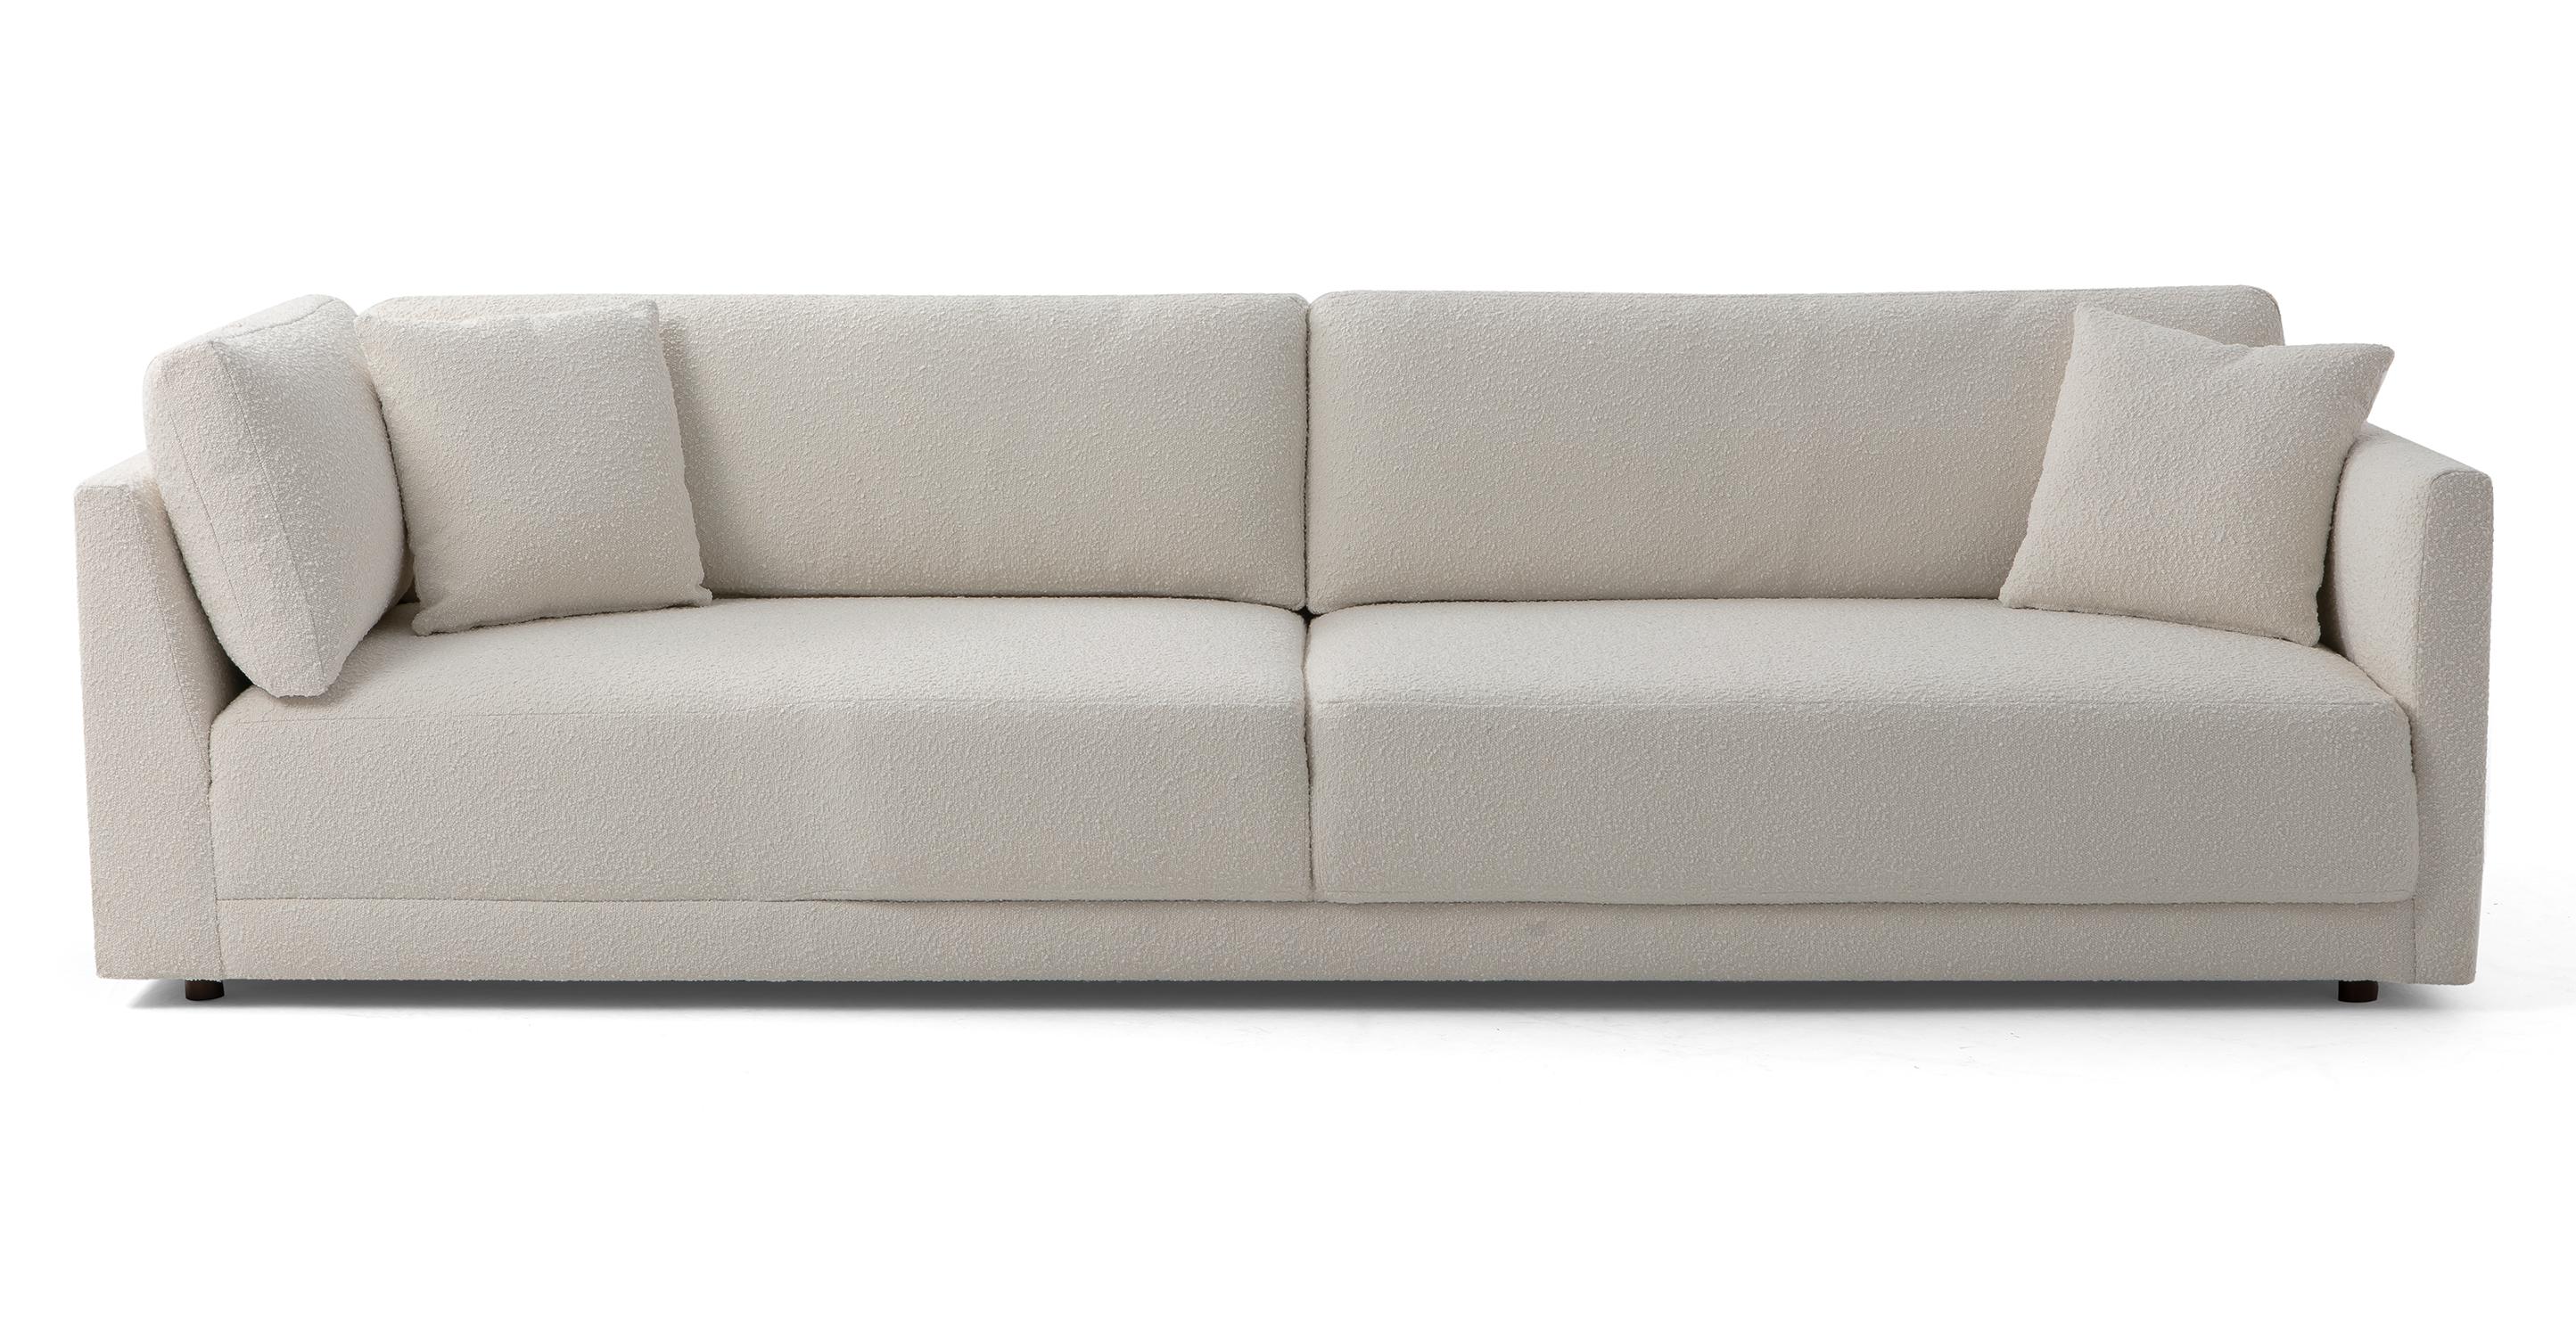 "Domus 114"" Fabric Sofa Lounge Arm Left, Blanc Boucle"